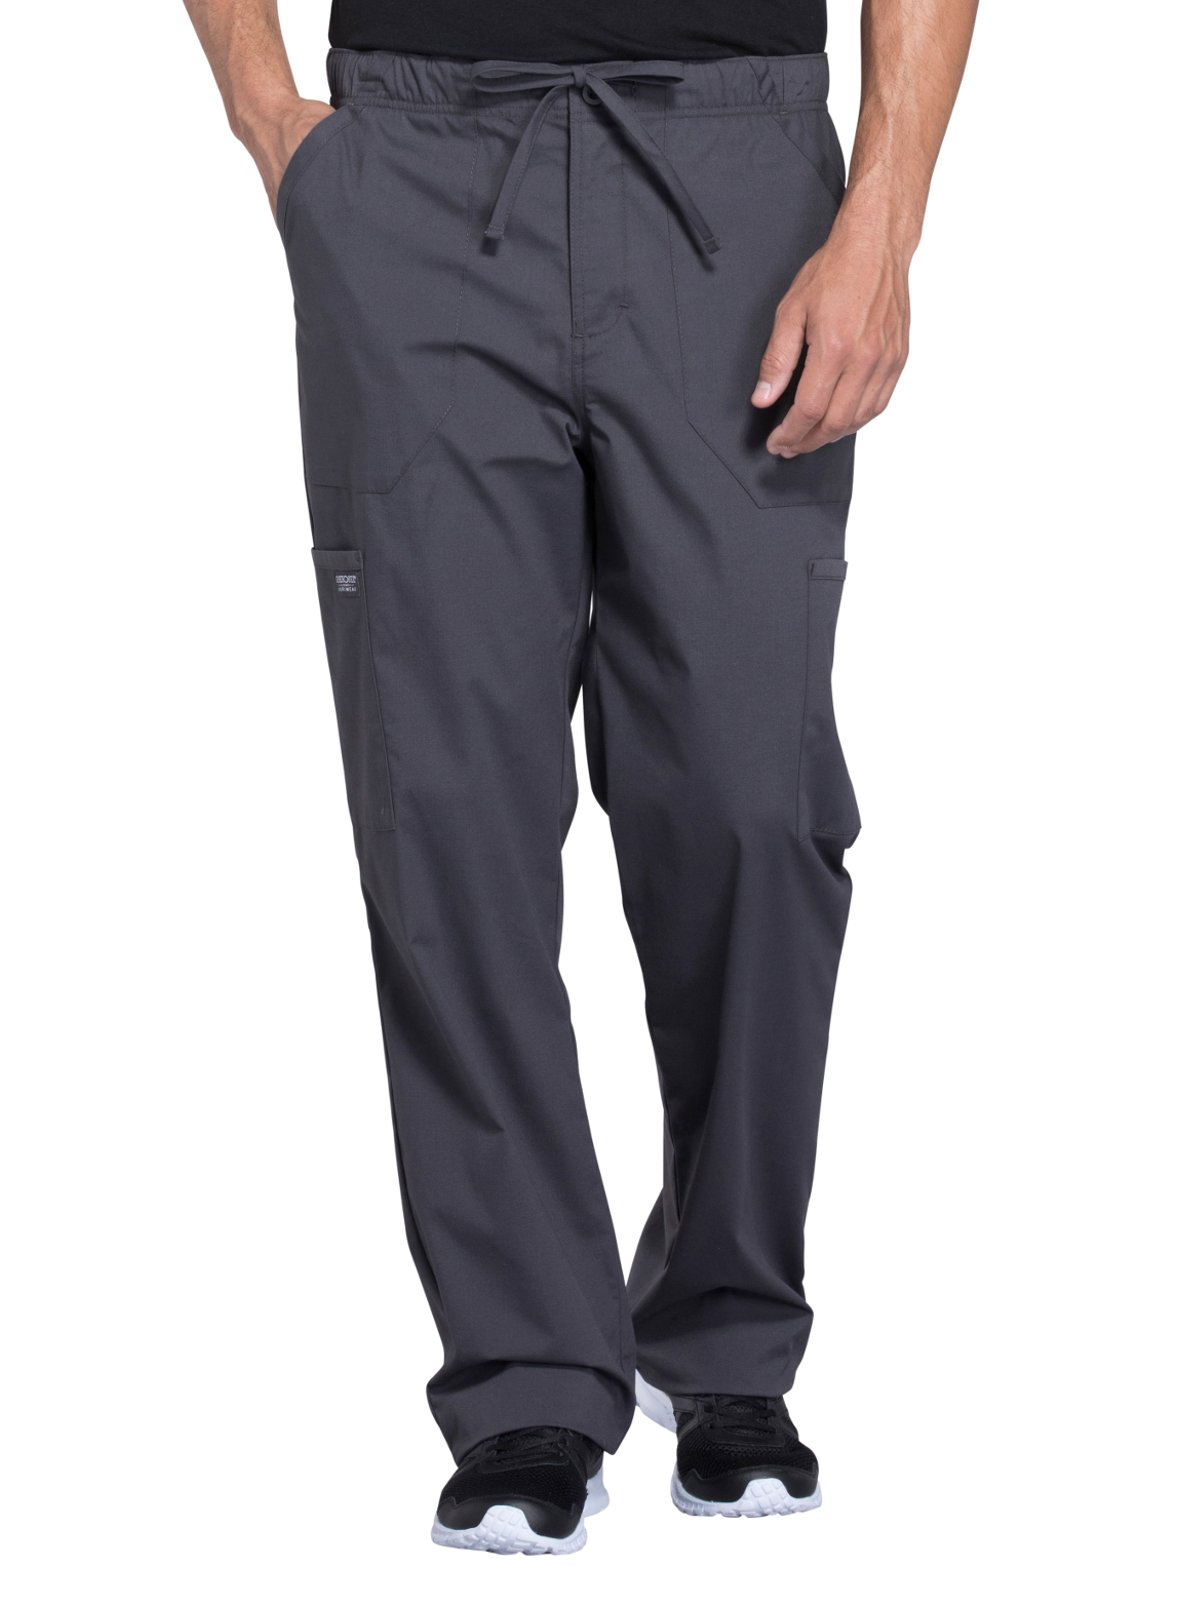 Cherokee WW Professionals WW190 Men's Tapered Leg Drawstring Cargo Pant Pewter L